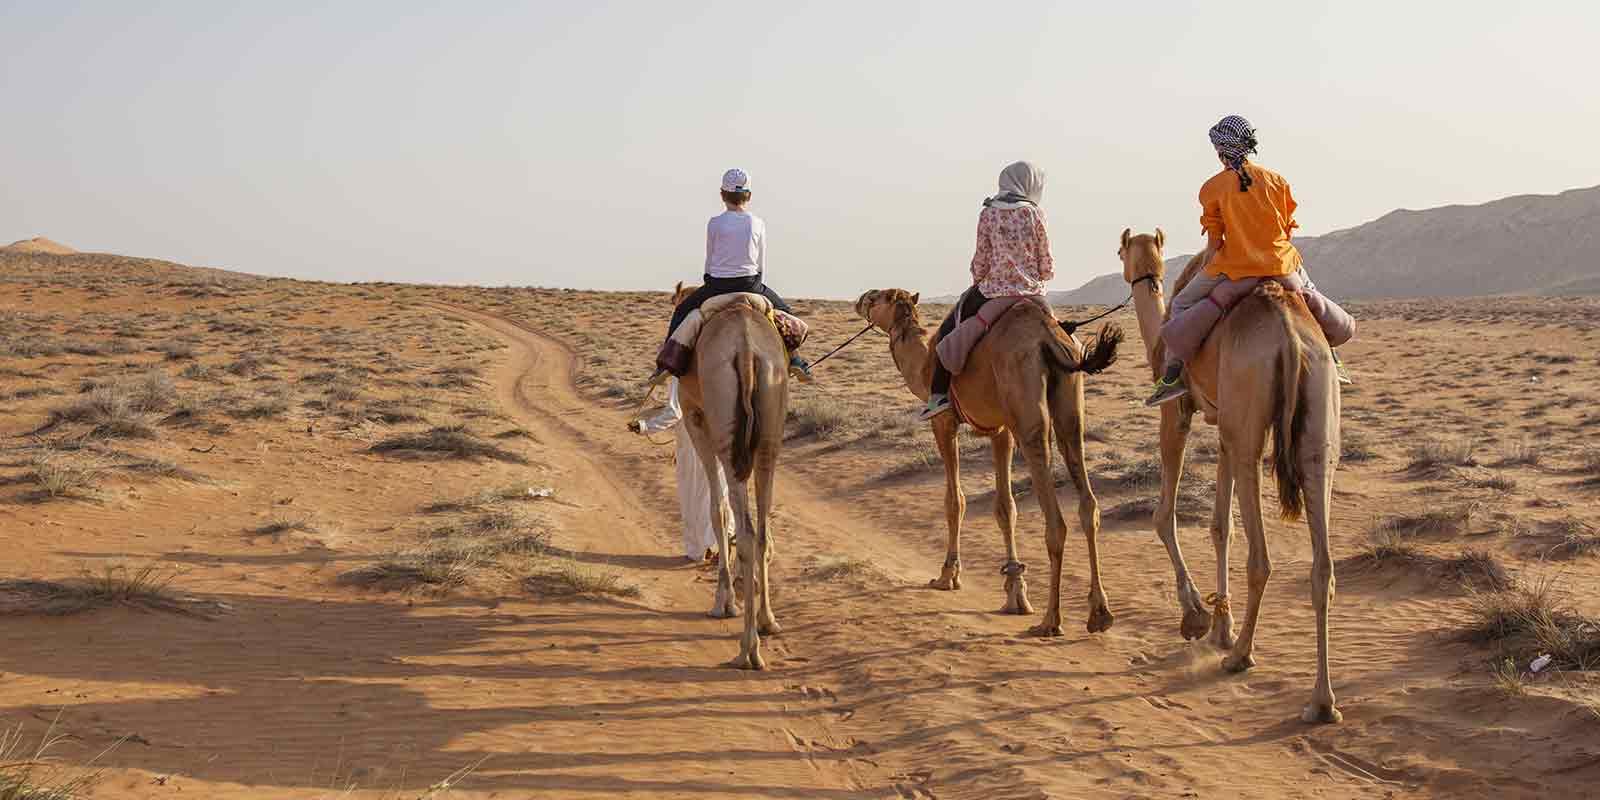 3 children on camels trekking through desert